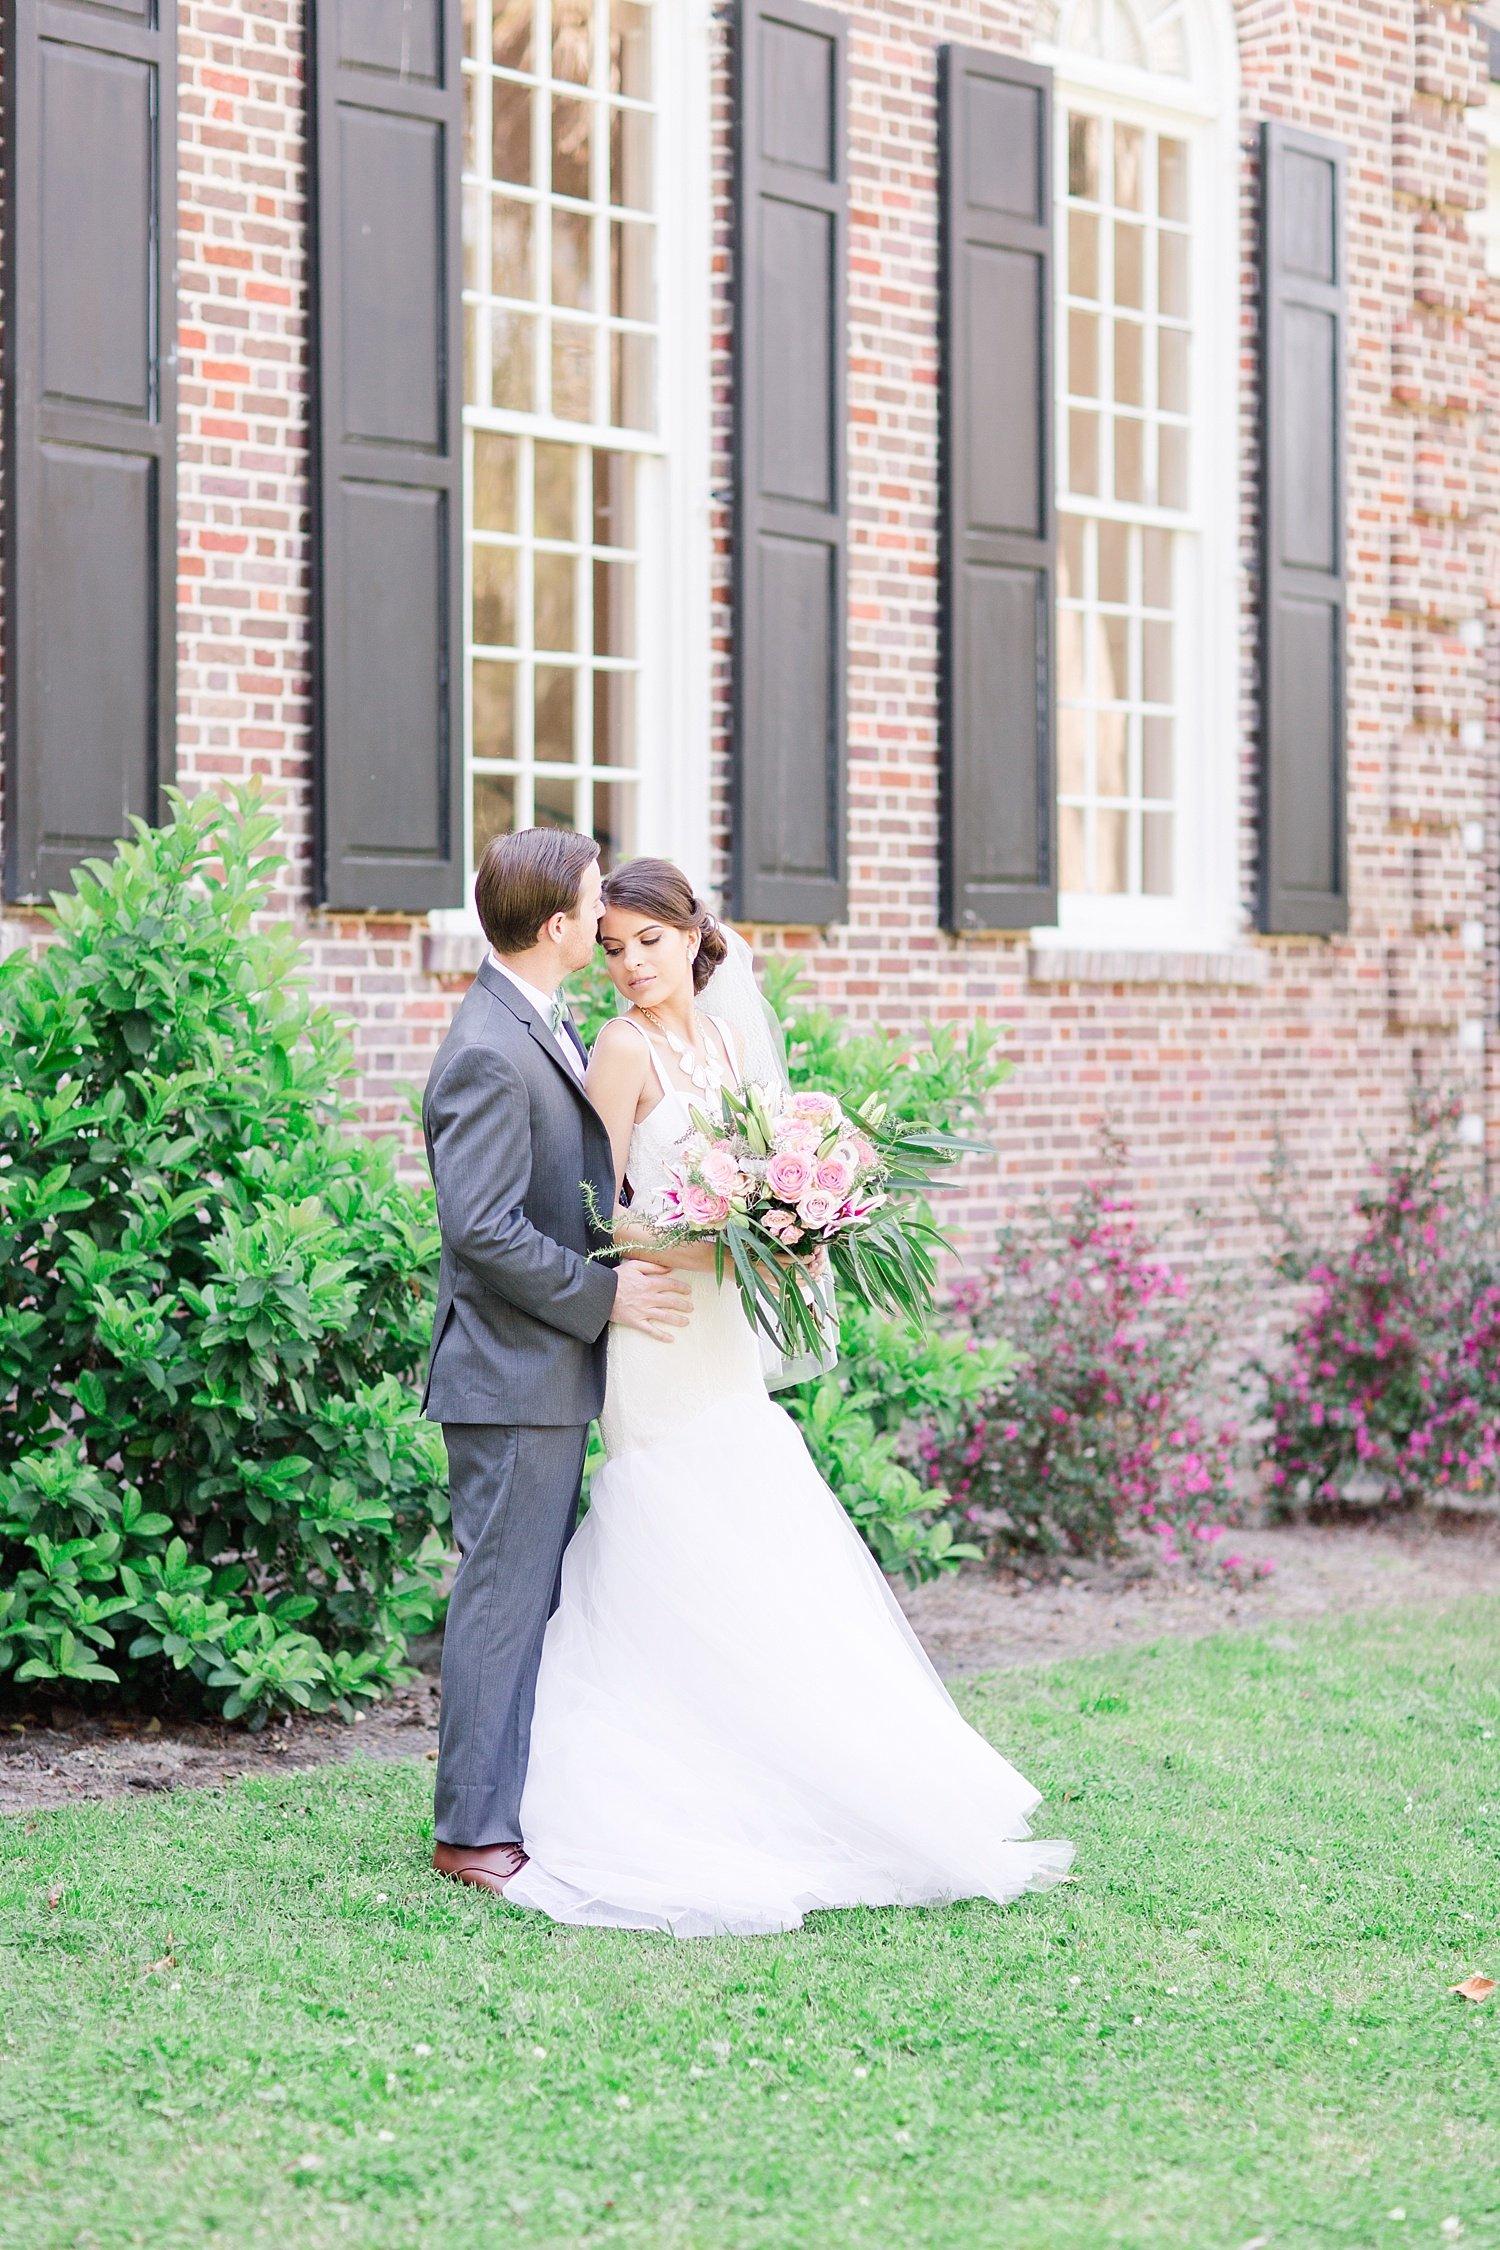 rachel-strickland-photography-katie-may-ivory-and-beau-bridal-boutique-bethesda-academy-wedding-whitfield-chapel-wedding-savannah-bridal-boutique-savannah-weddings-savannah-wedding-savannah-wedding-planner-savannah-bridal-gowns-savannah-bride-4.jpg